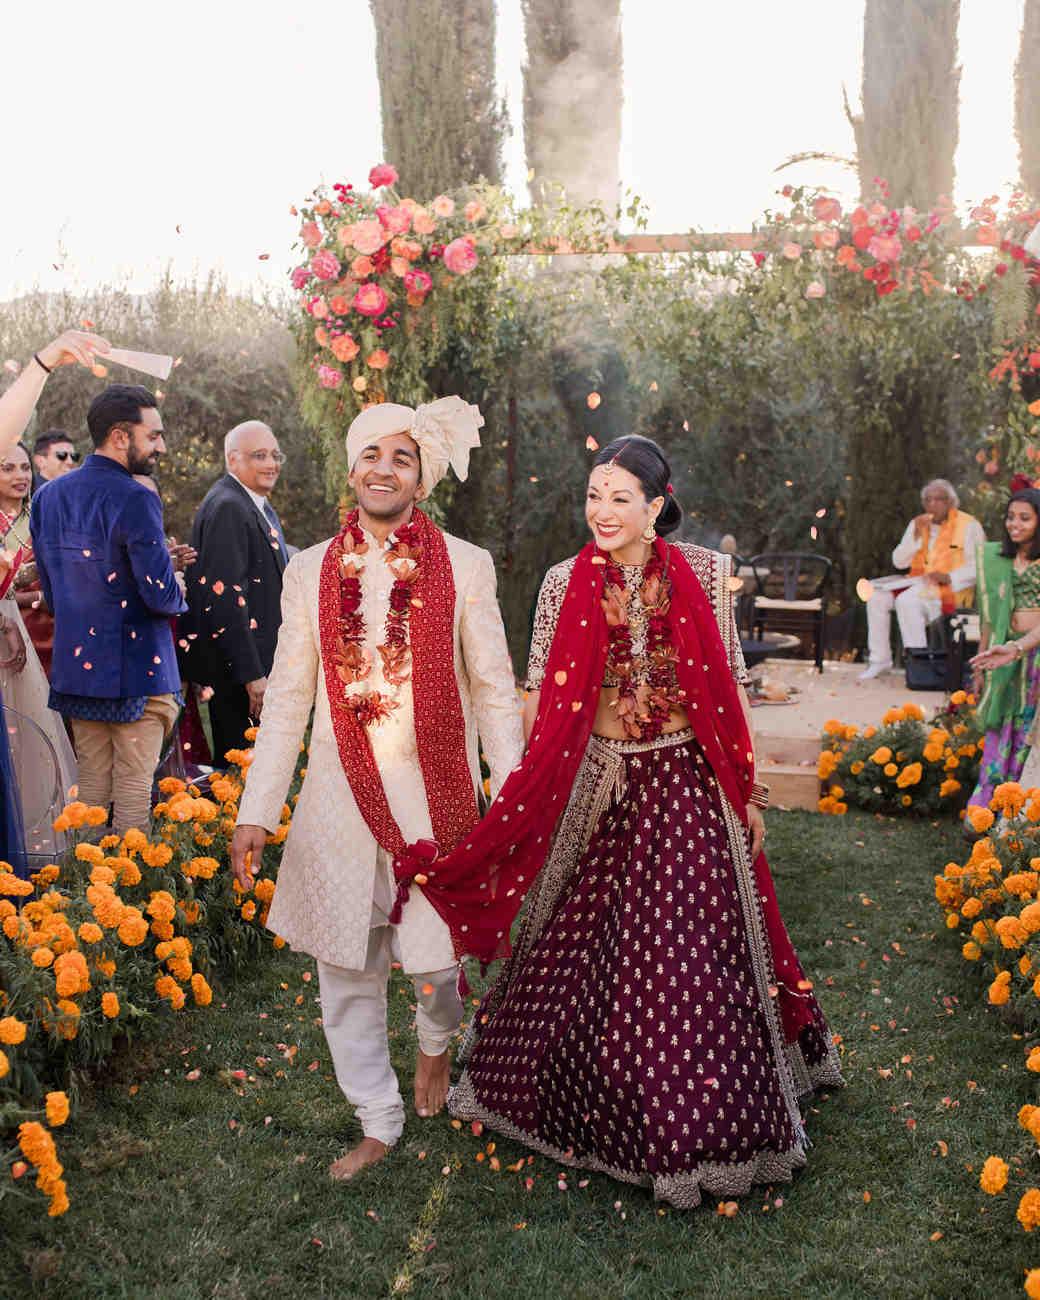 jenna alok wedding wine country california recessional